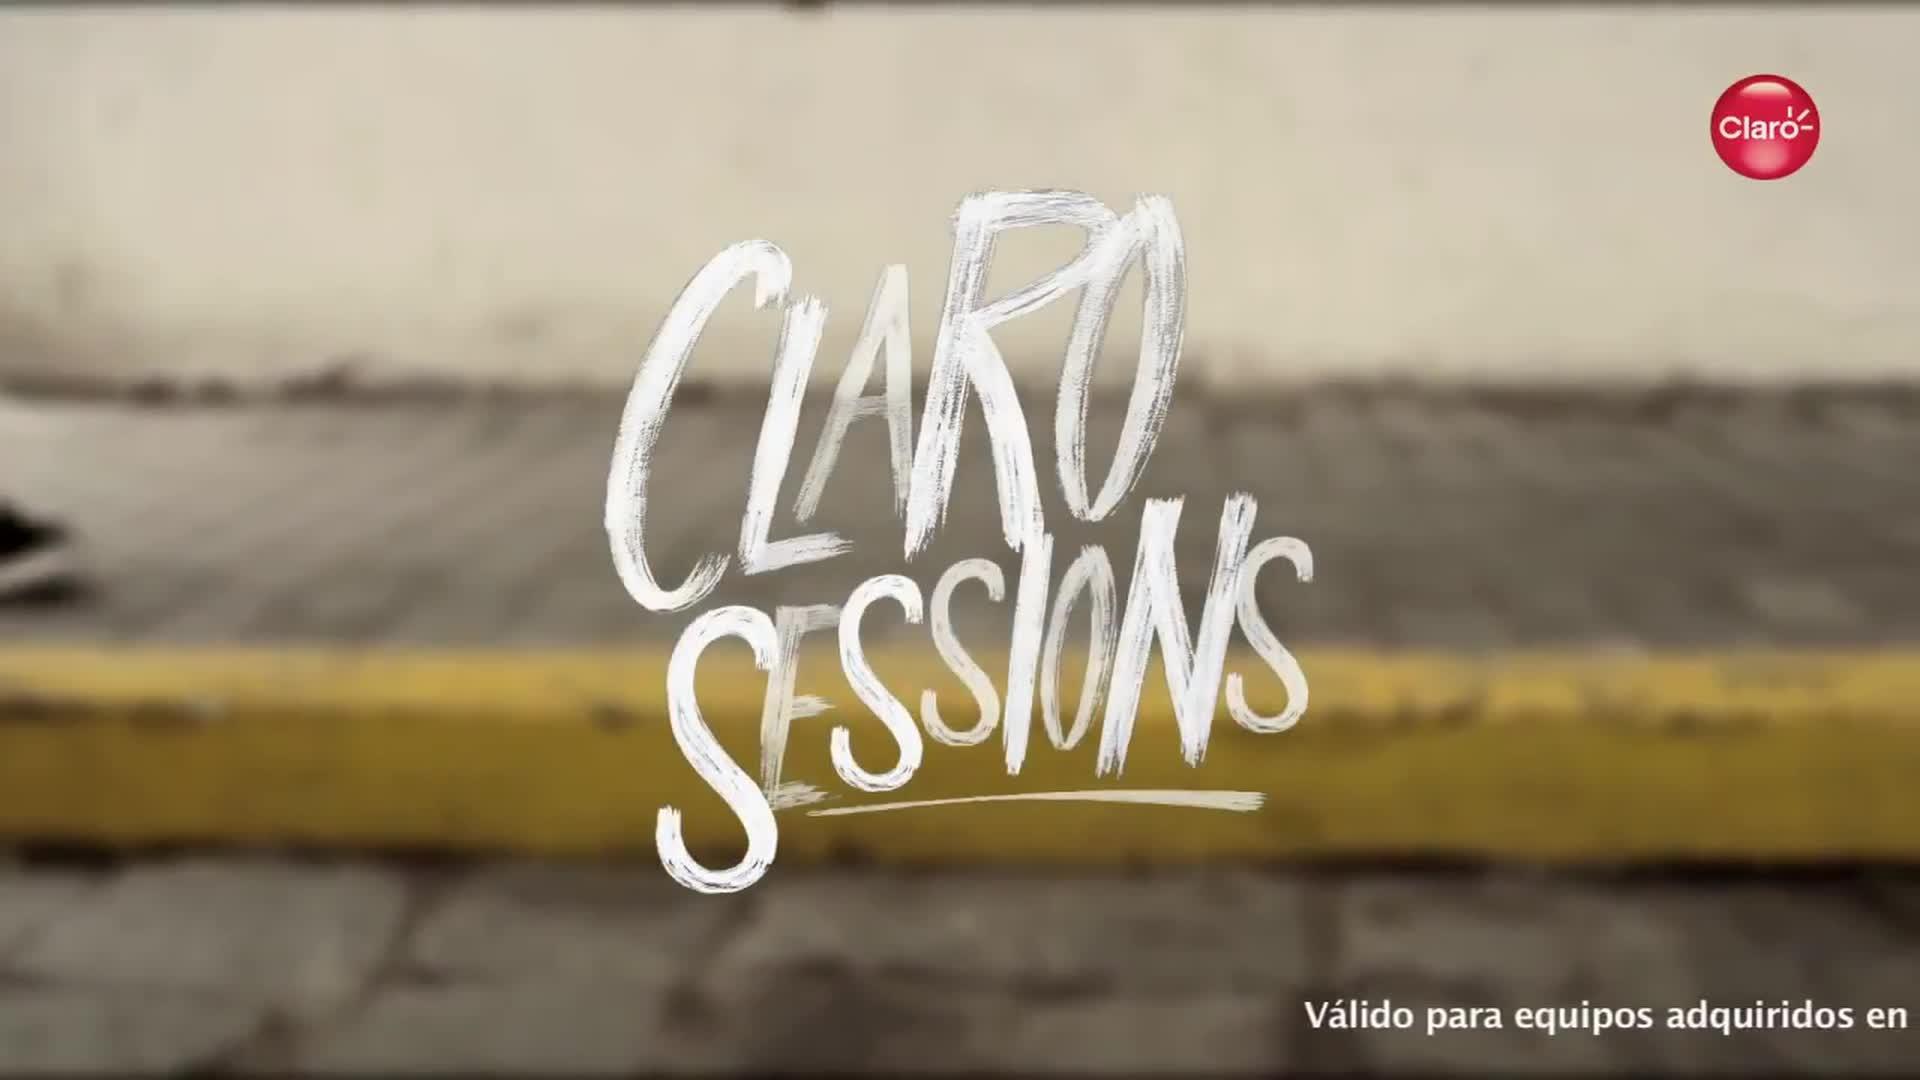 Claro - Sessions